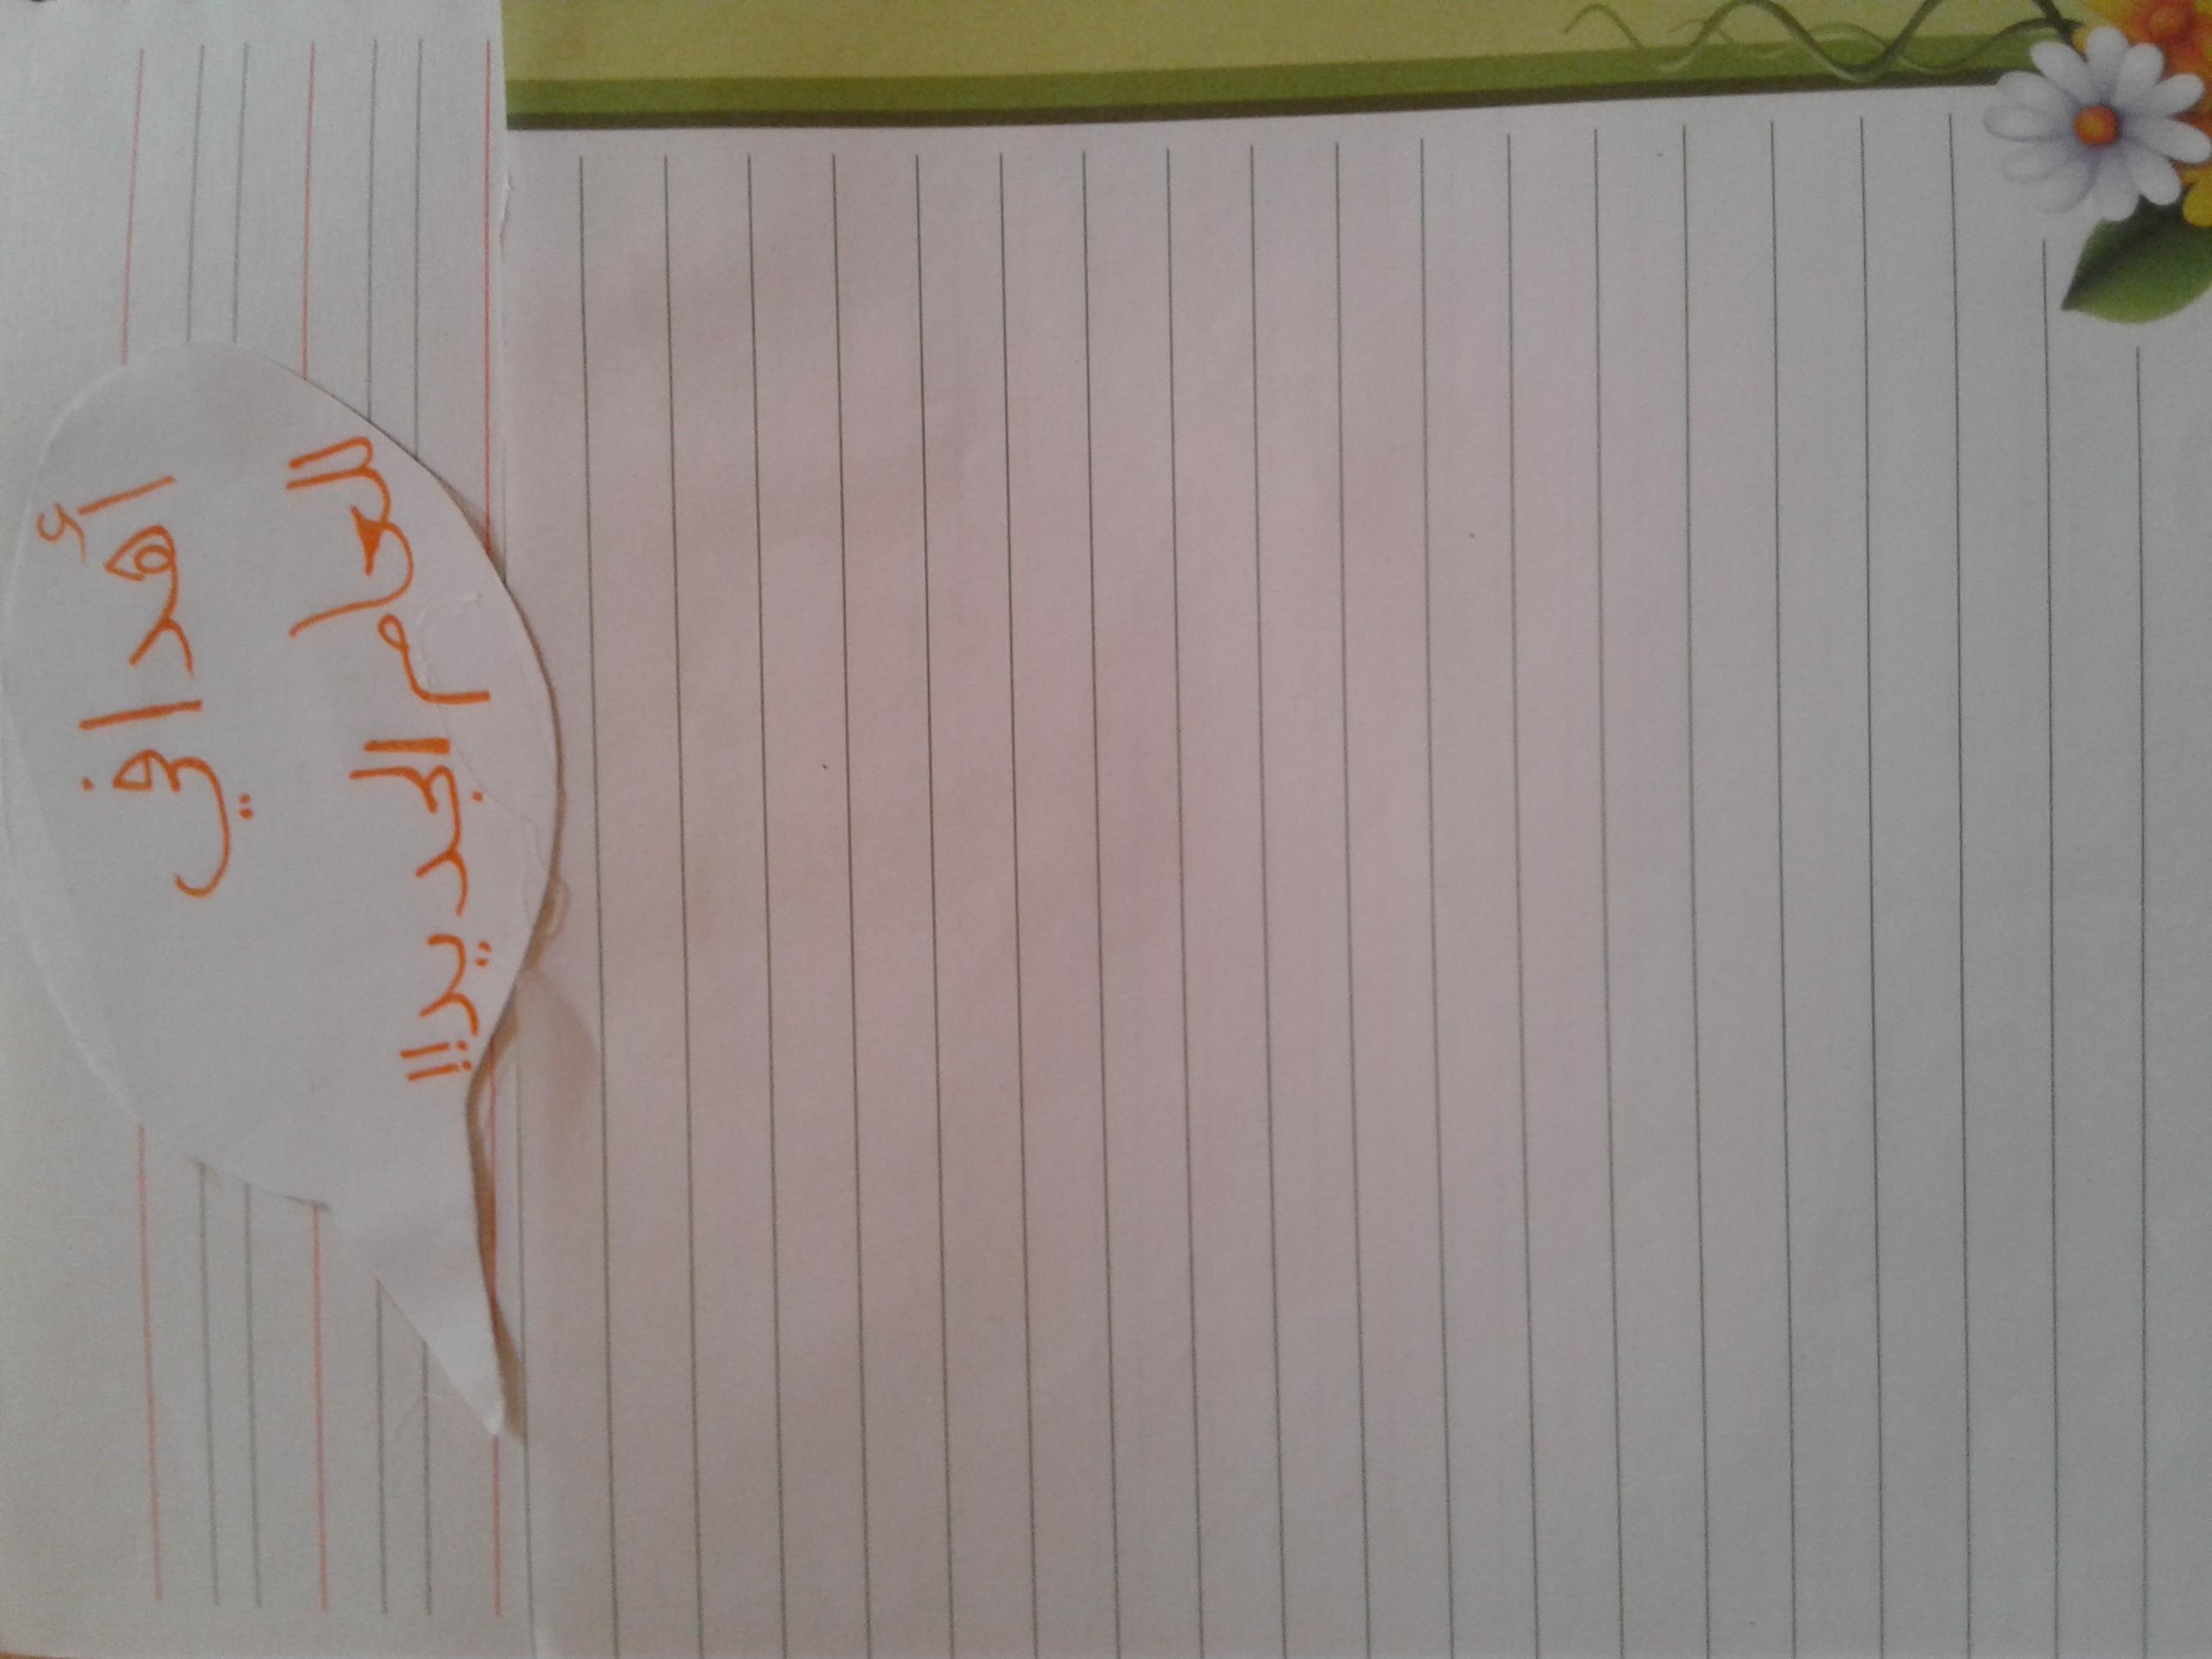 akhawat_islamway_1502918858___.jpg